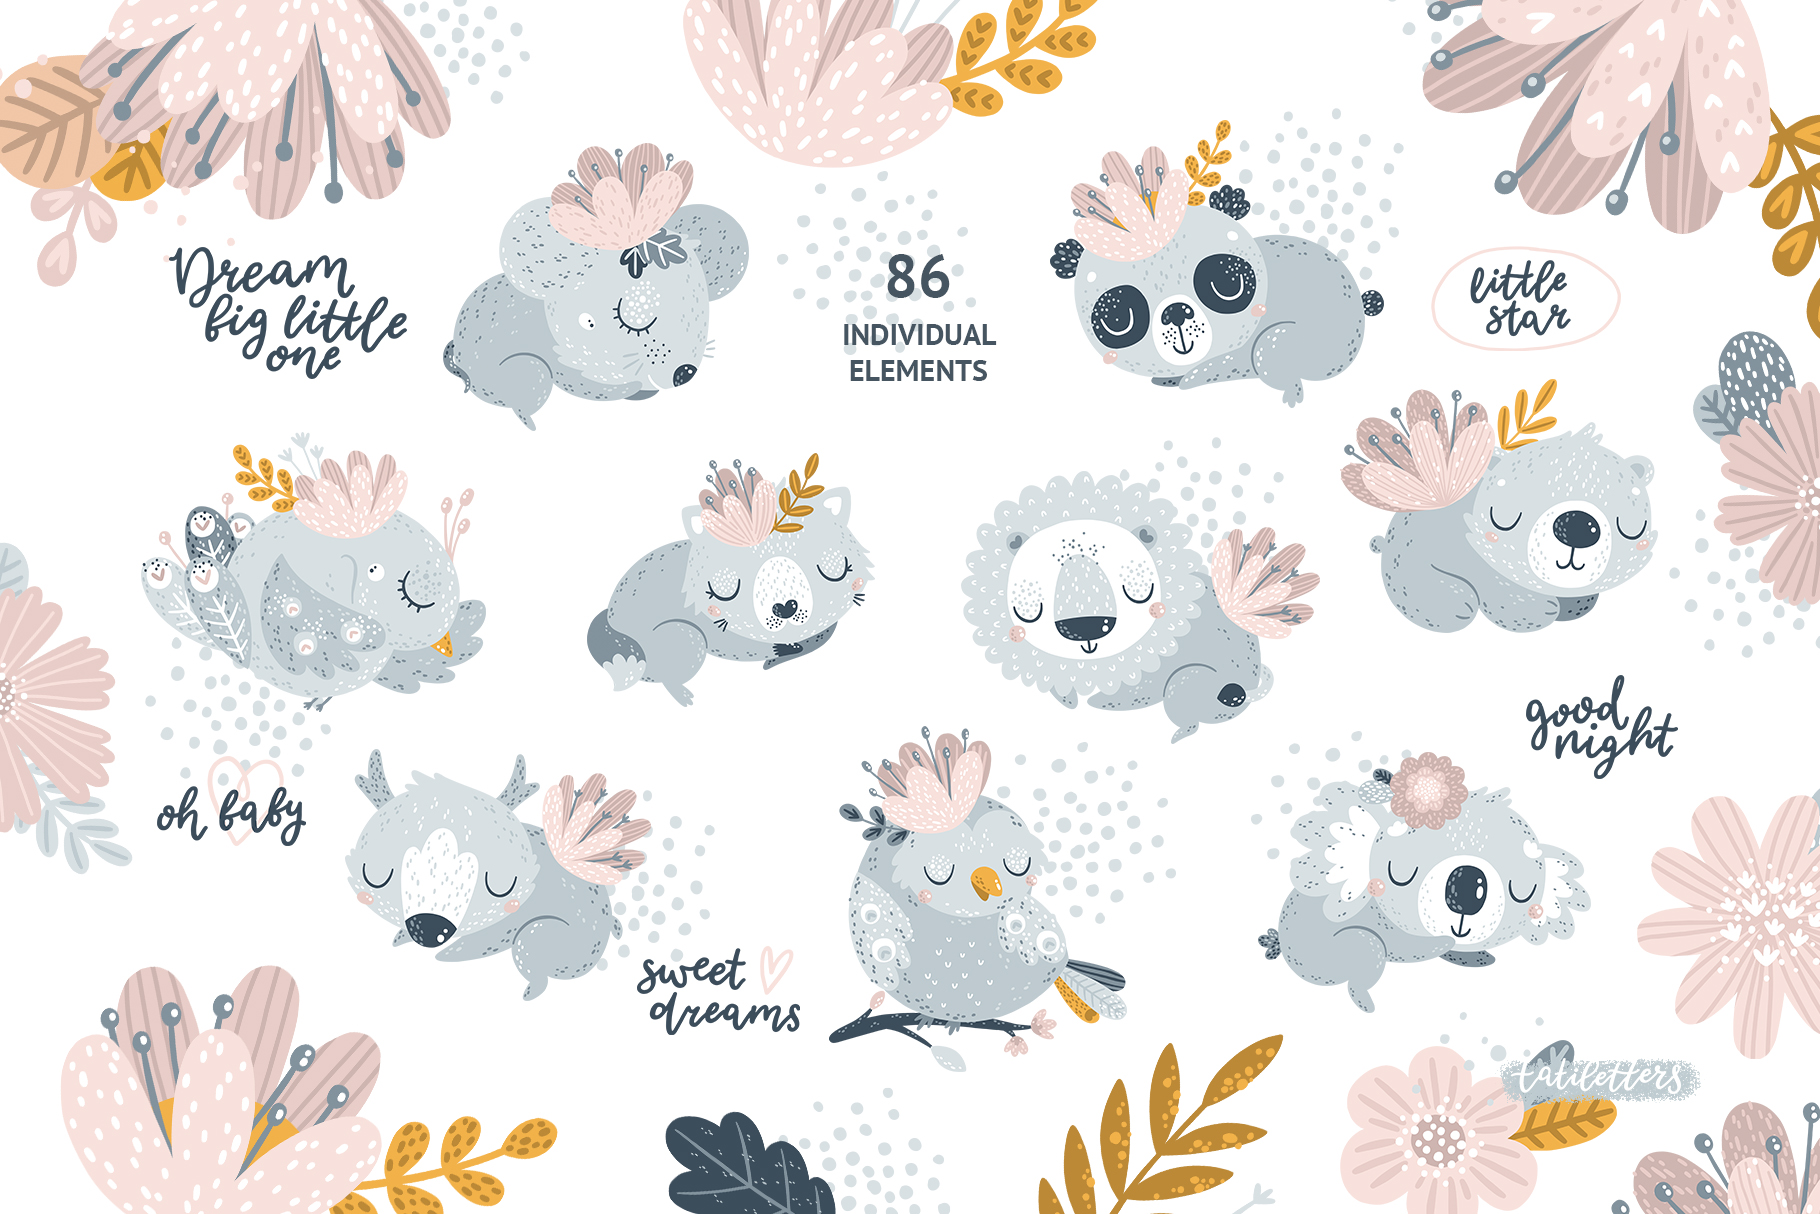 Sleeping baby animals clipart jpg download Sleeping Baby Animals Clipart and Patterns jpg download